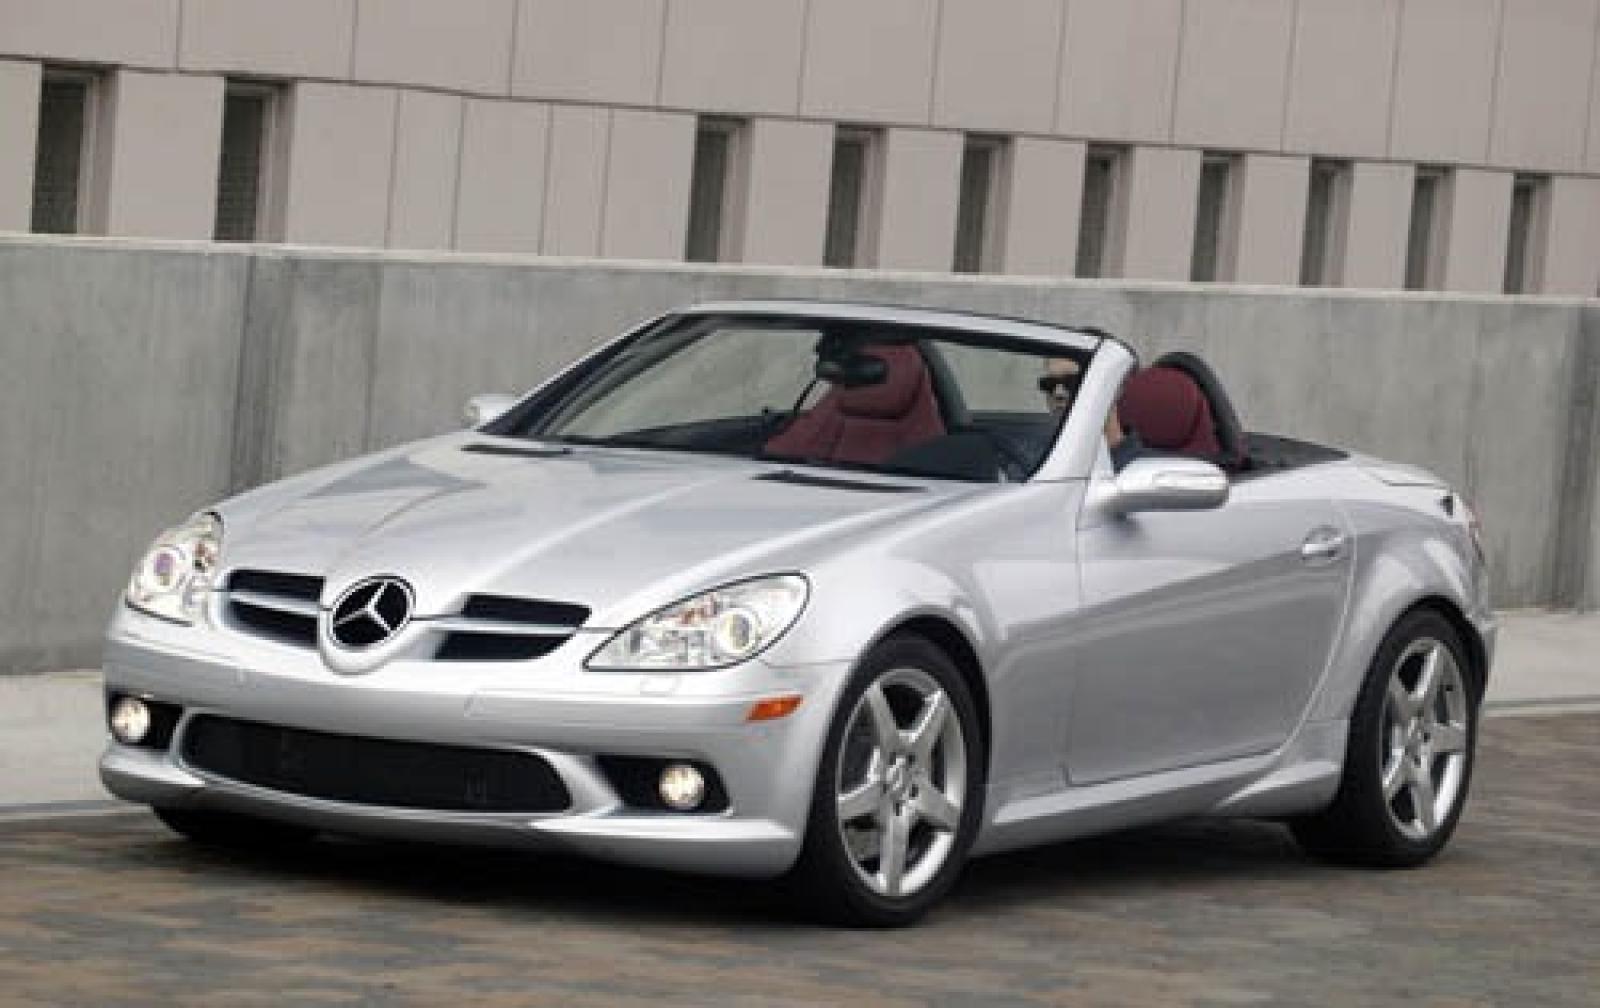 2005 mercedes benz slk class information and photos for Mercedes benz slk350